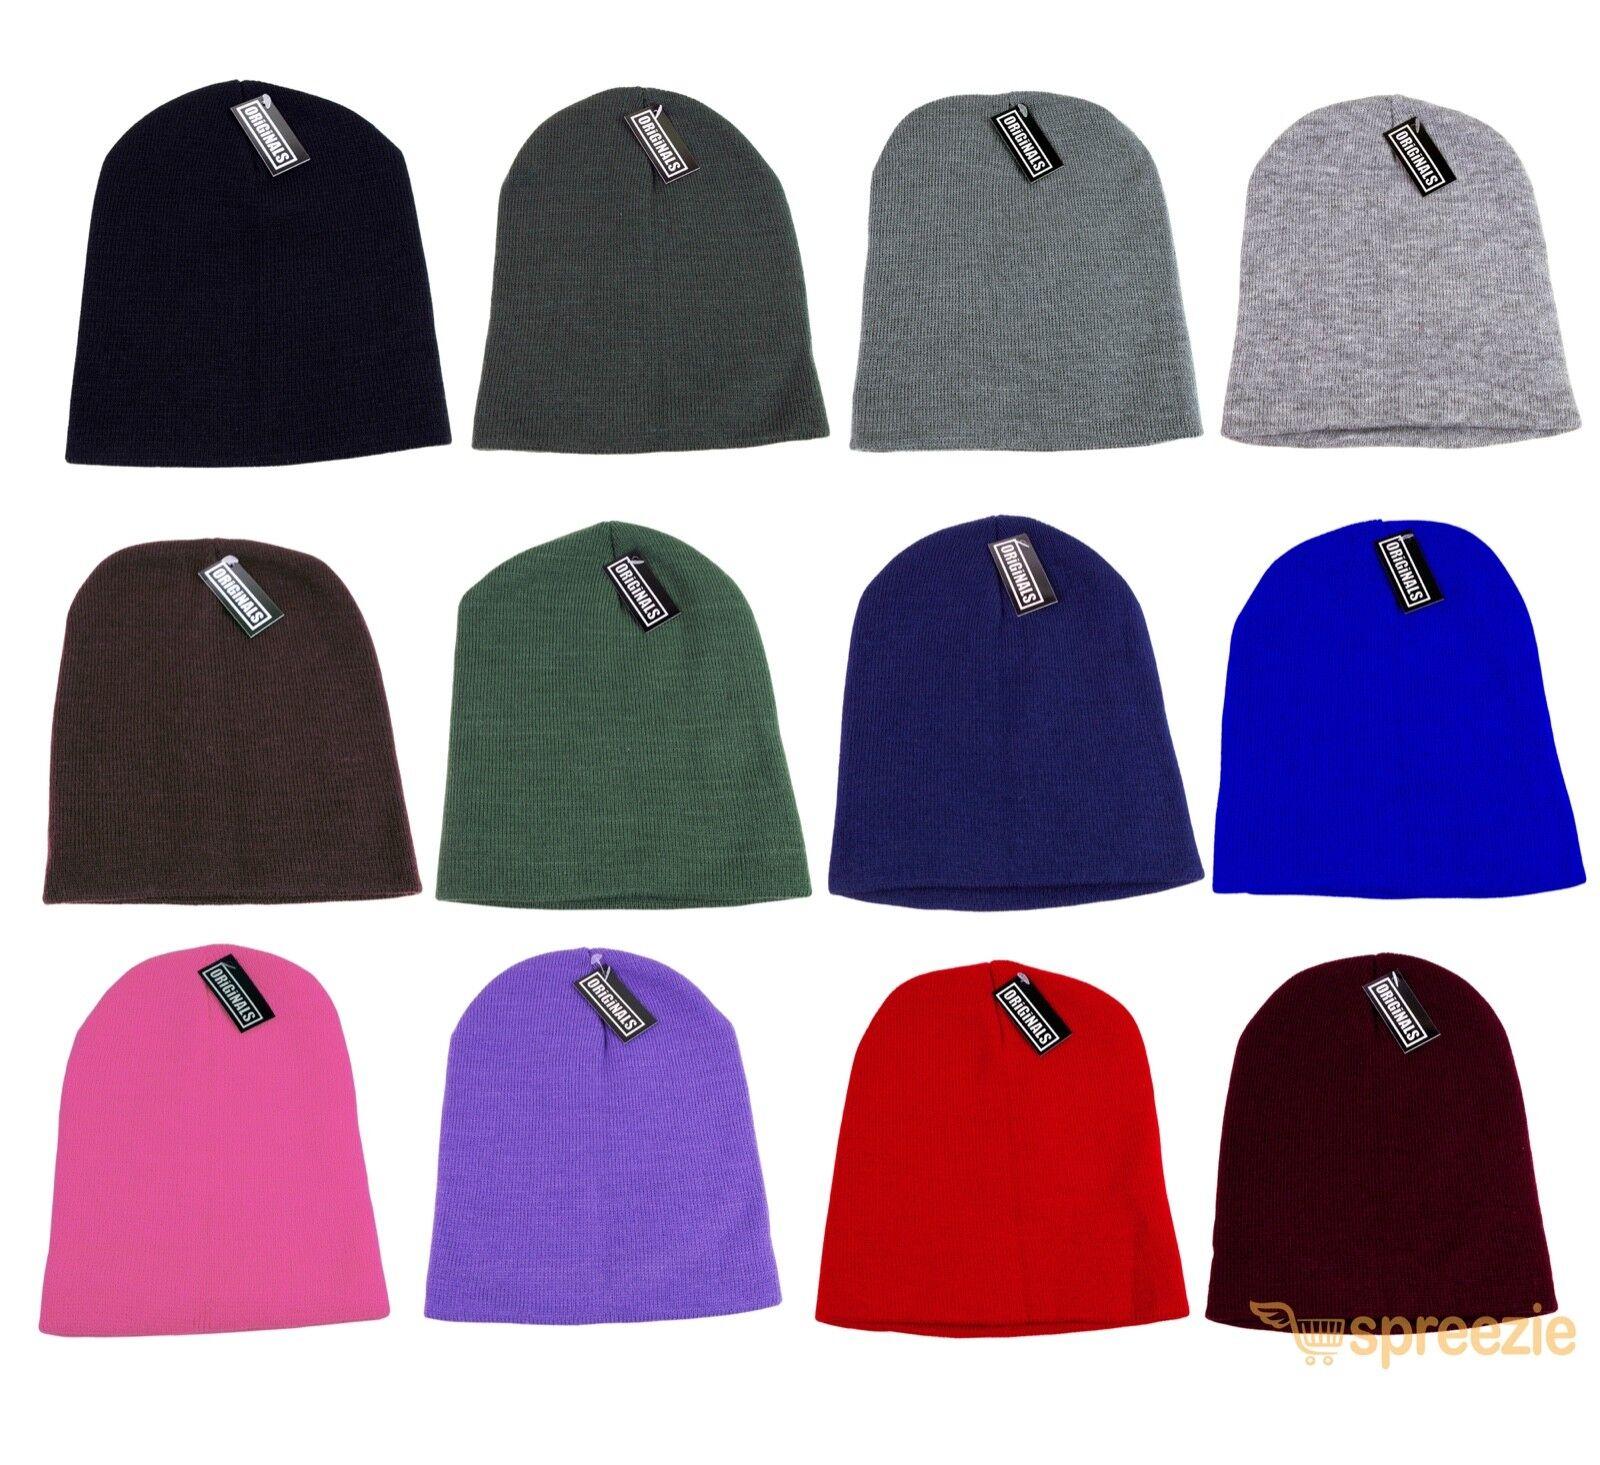 Plain Beanie Skull Cap Skully Knitted Hat Colors Warm Winter